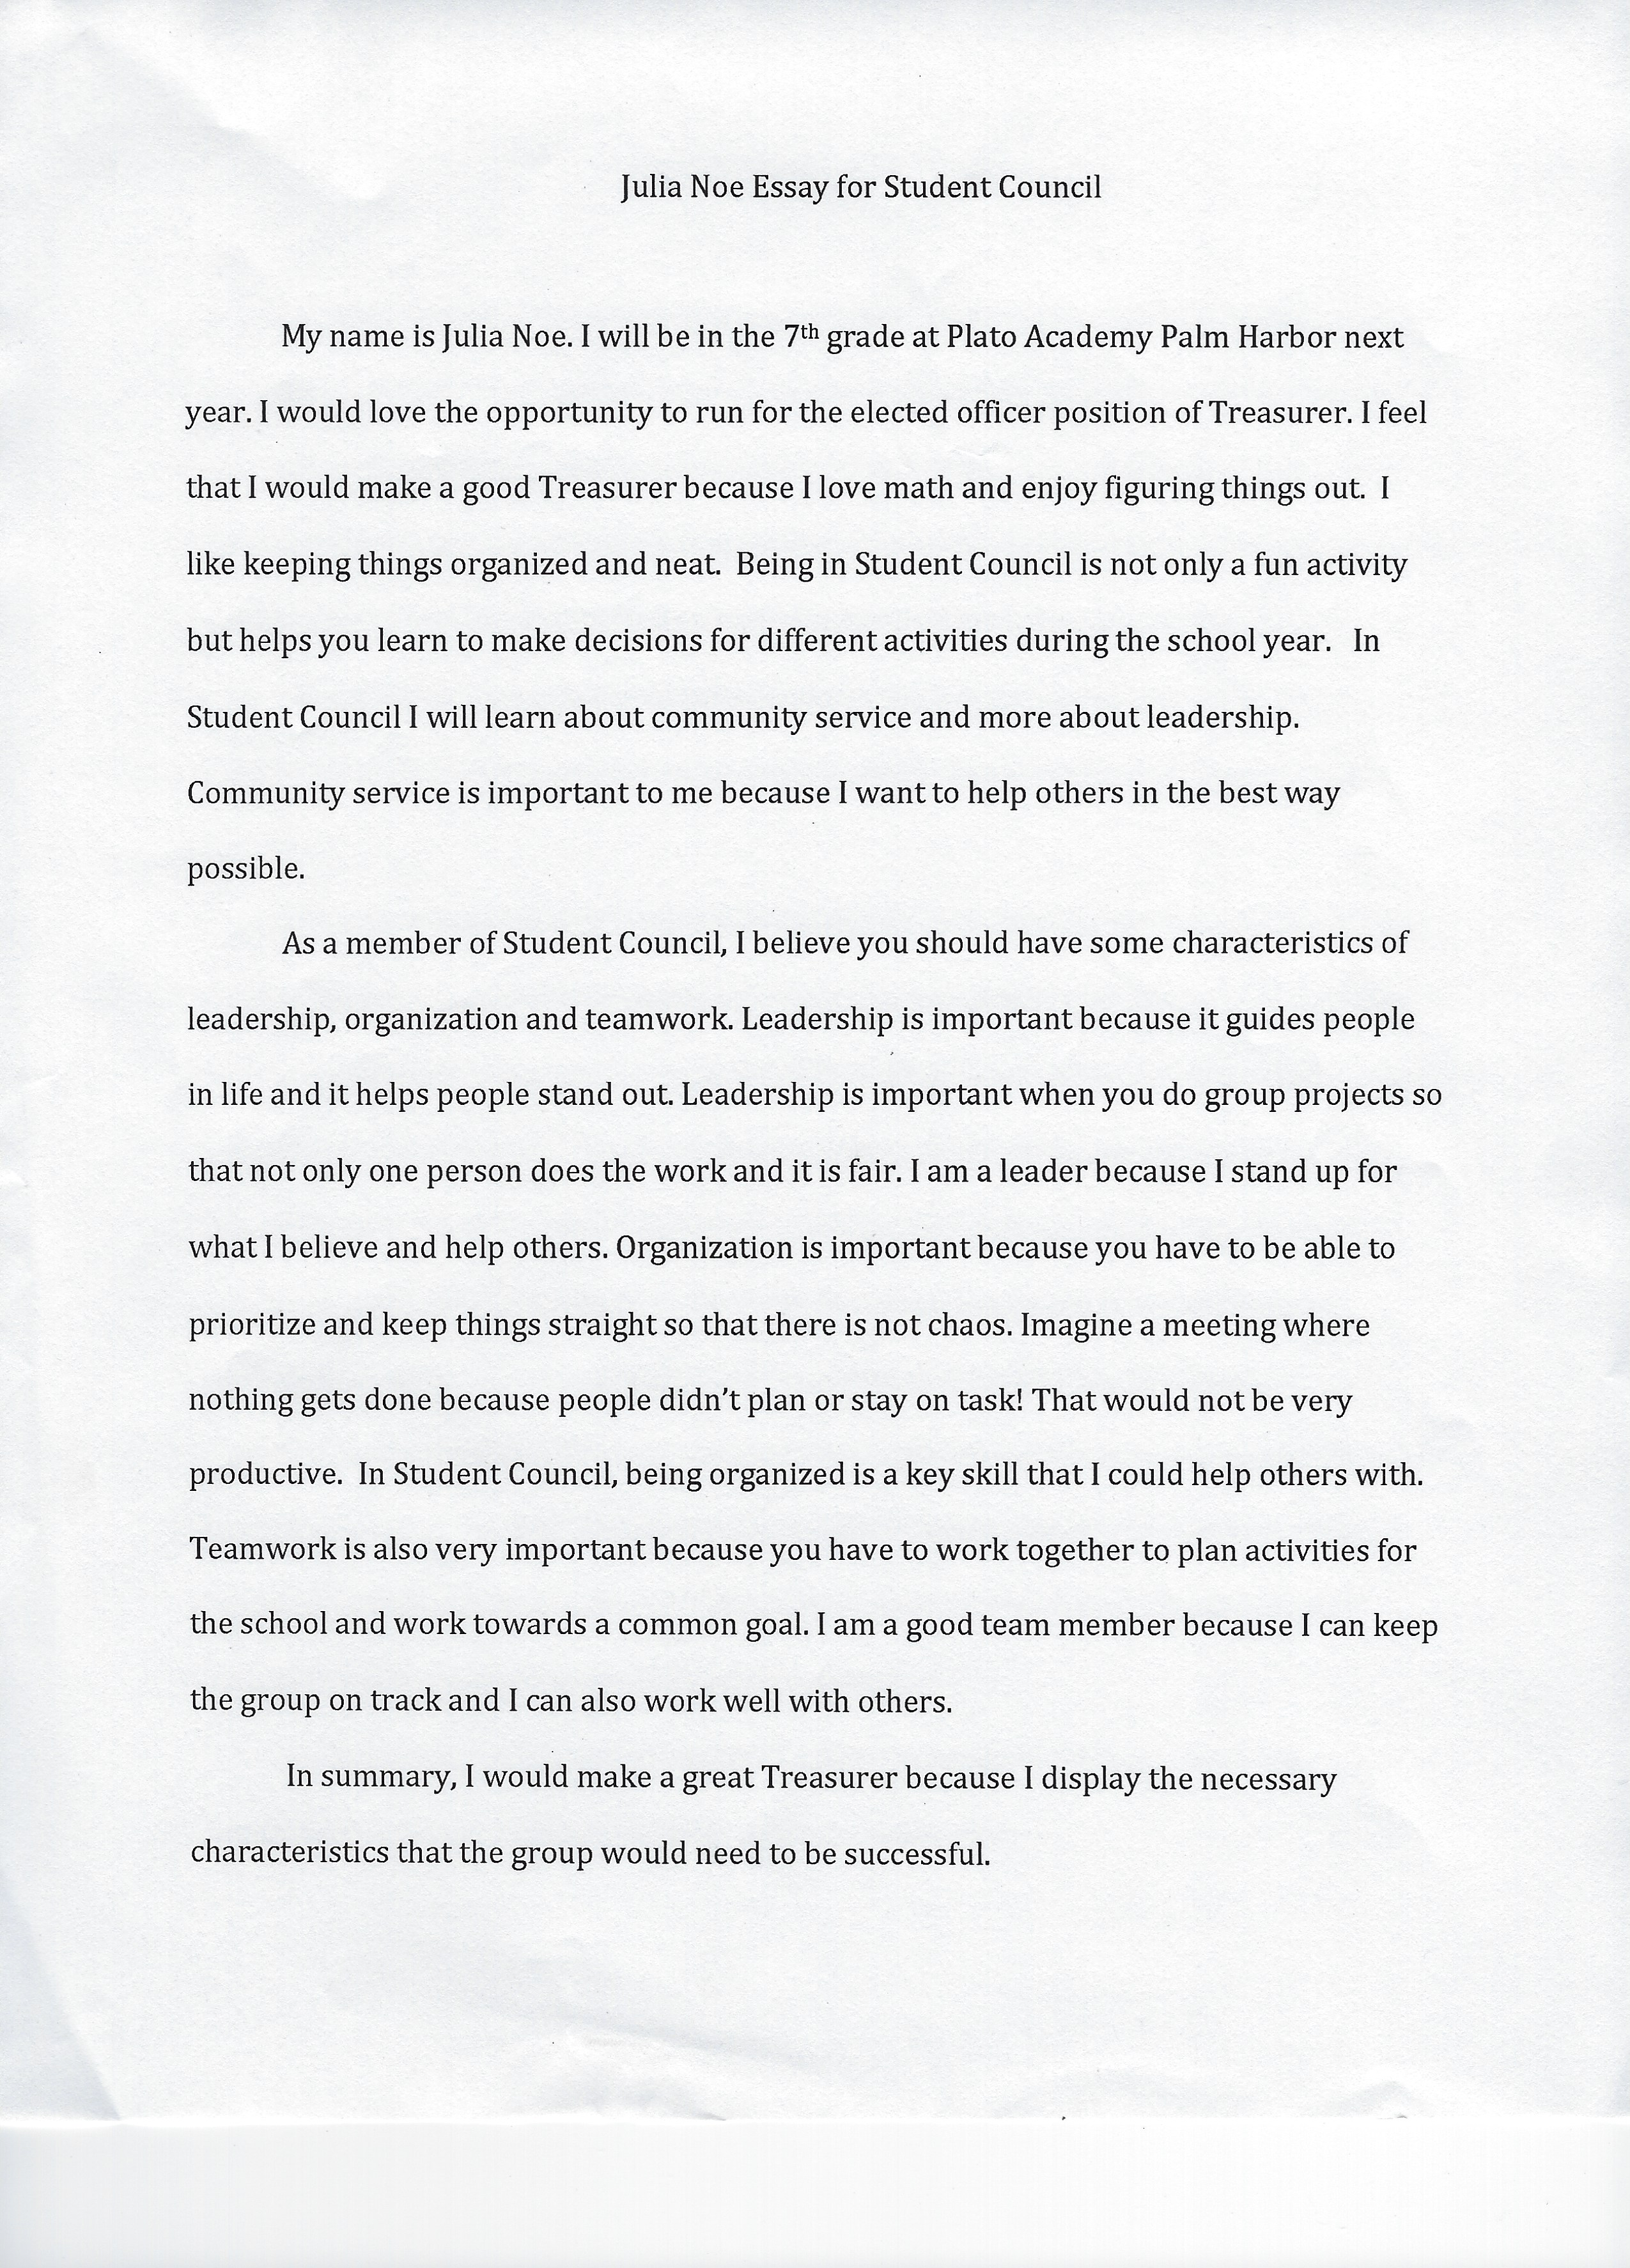 009 Student Council Essay Example Treasurer Noe Phenomenal Rubric Conclusion Full